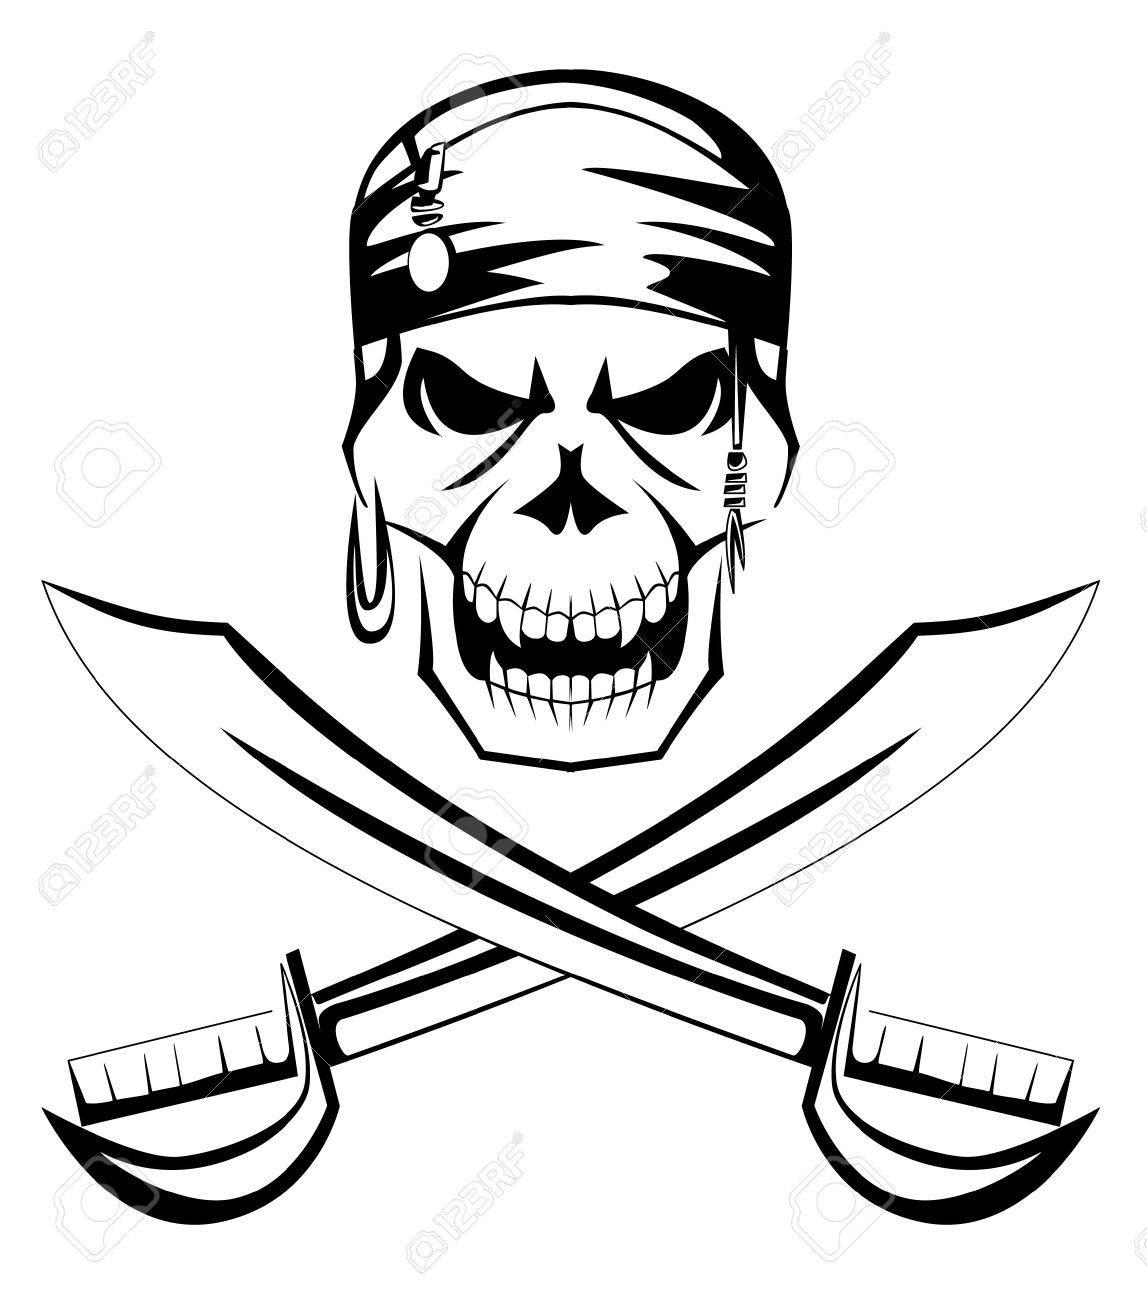 jolly roger pirate skull sword